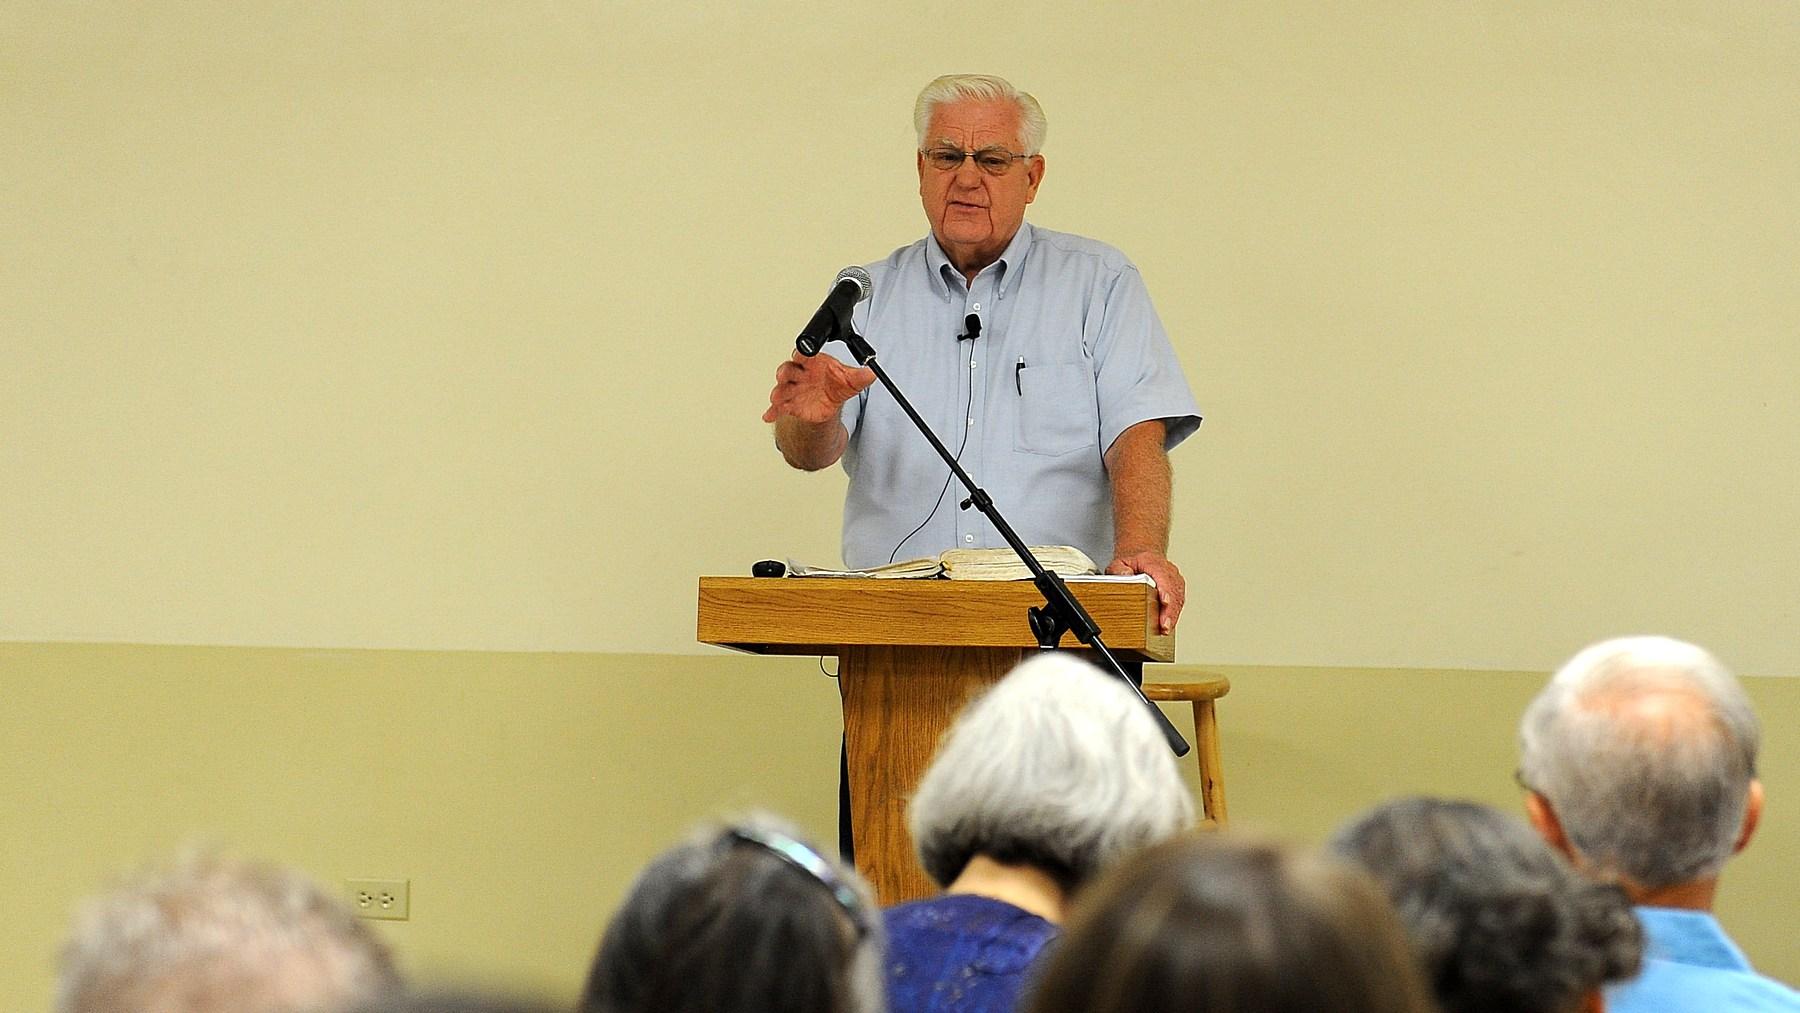 Dr. Les Ollila